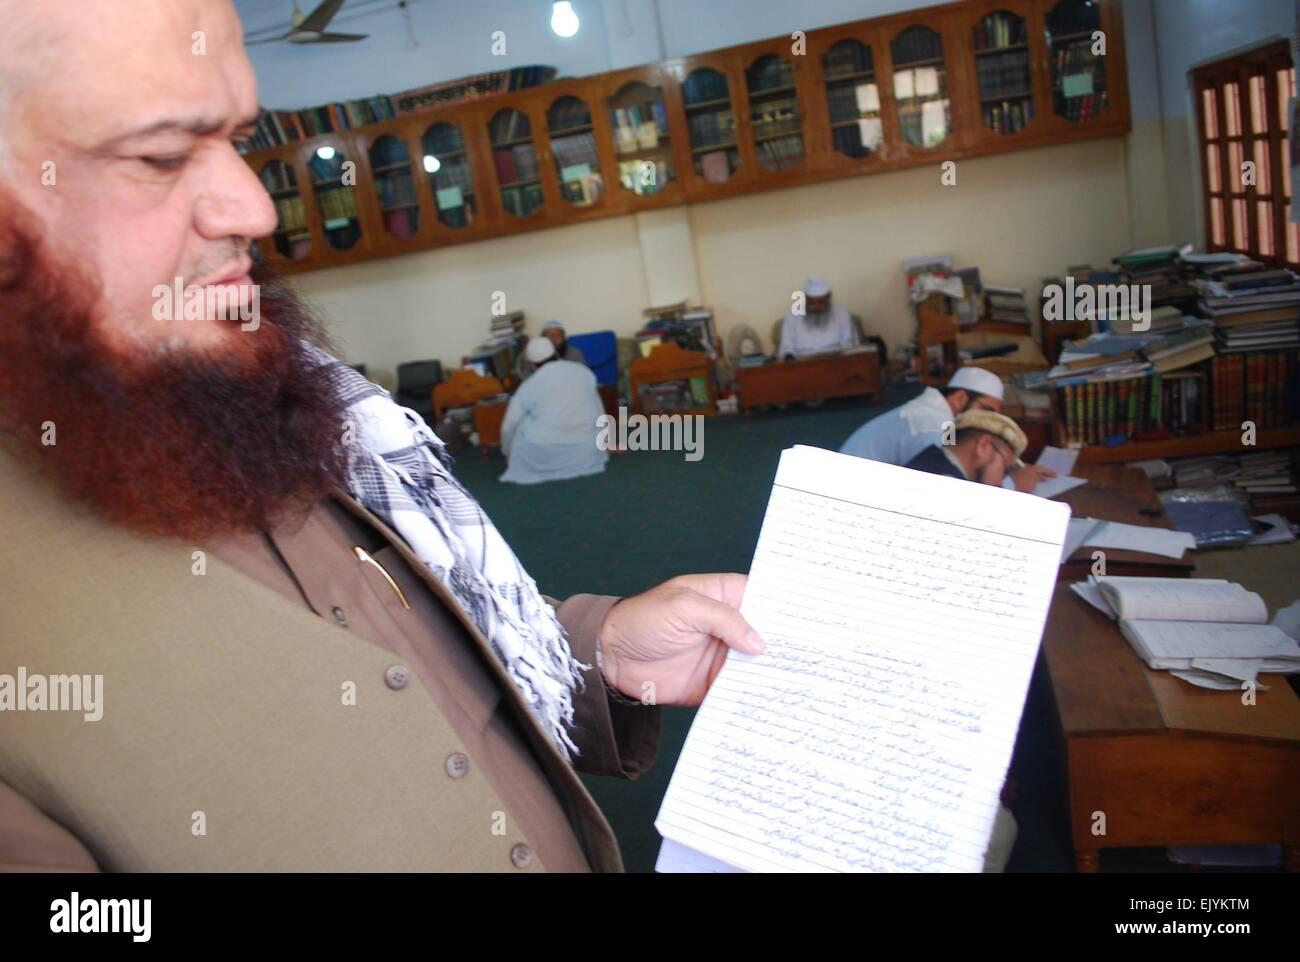 Islamic School Pakistan Stock Photos & Islamic School